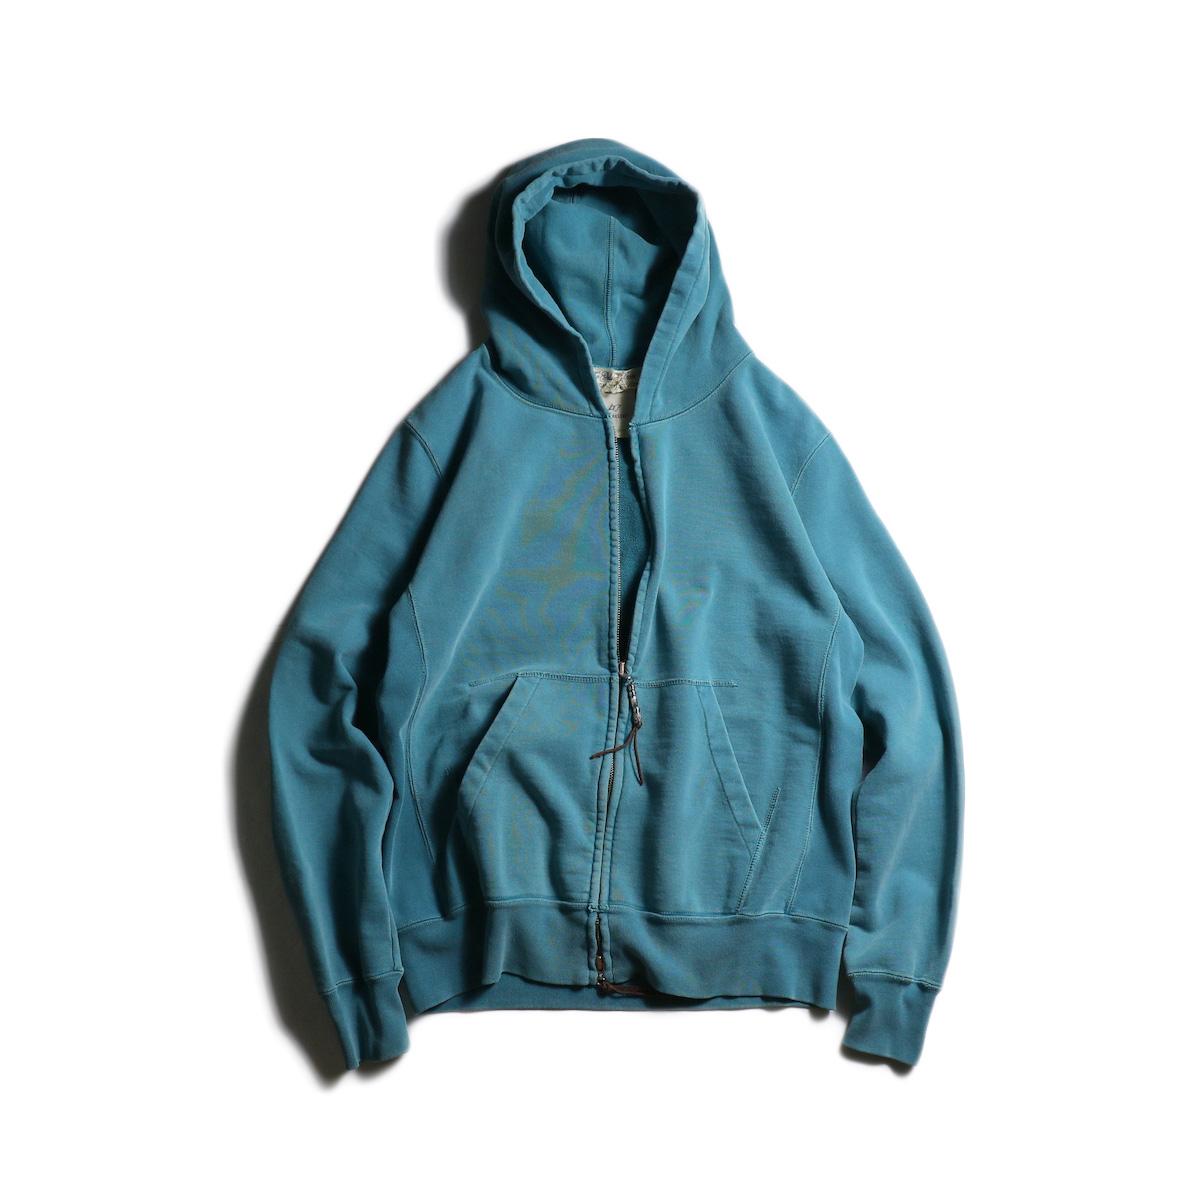 REMI RELIEF / スペシャル加工裏毛 ZIPパーカ (Green)